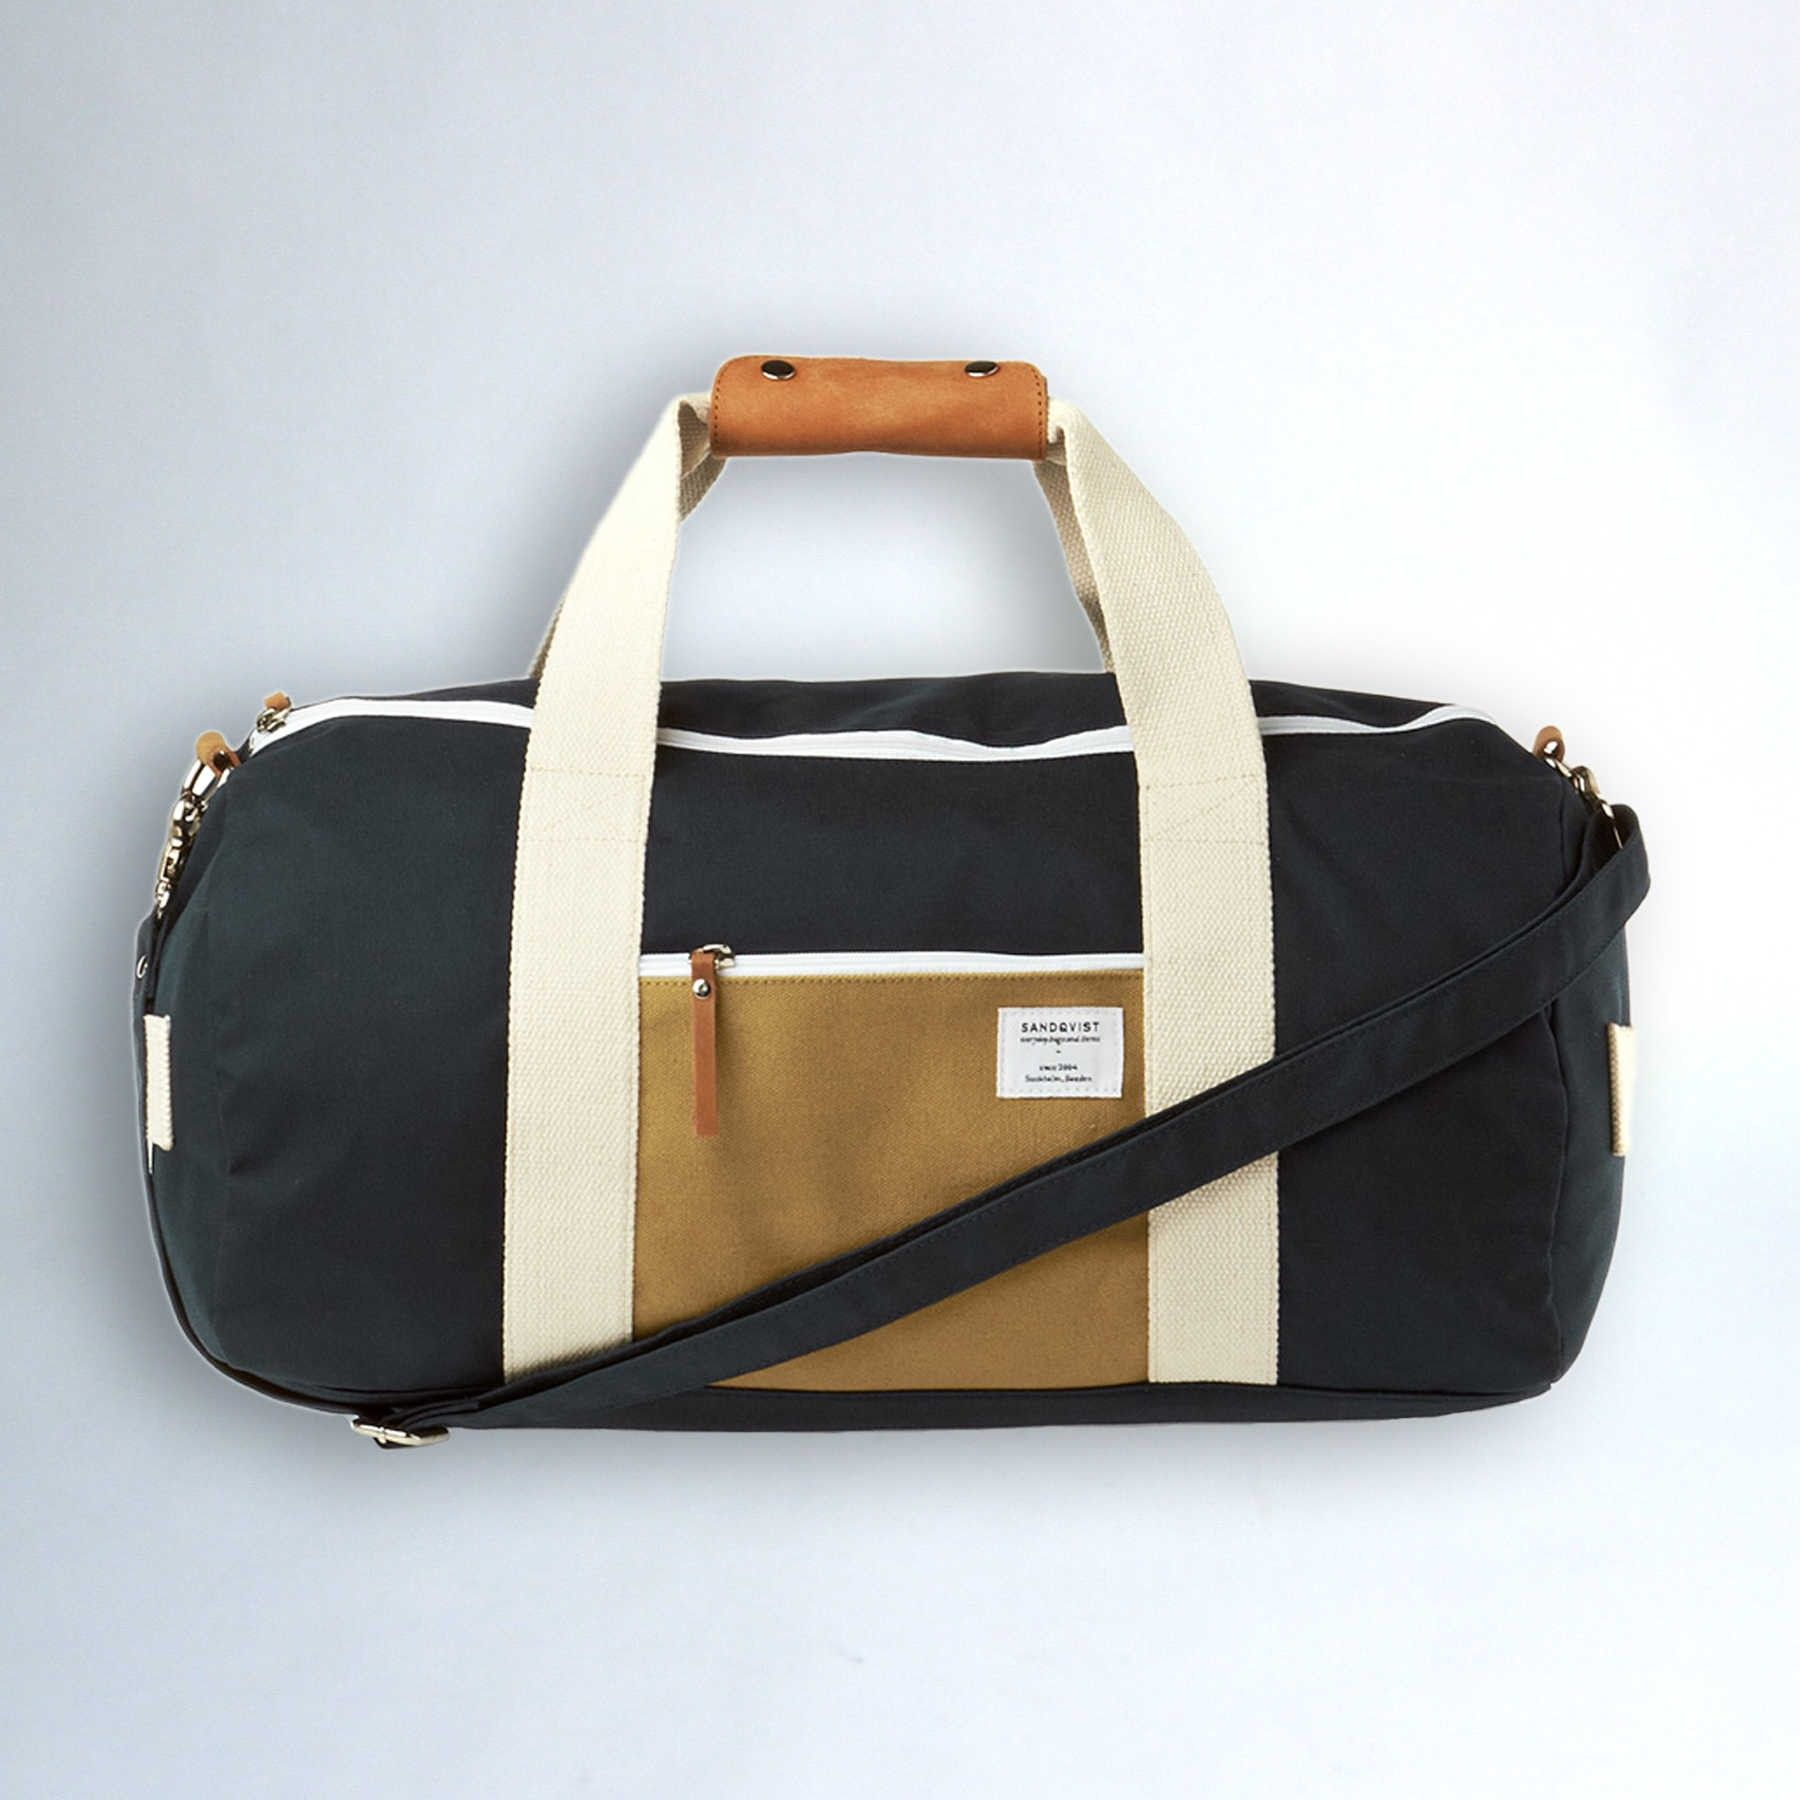 ae33c935a Sandqvist Ingo Sport Bag | Mens Style | Costura criativa, Costura e ...